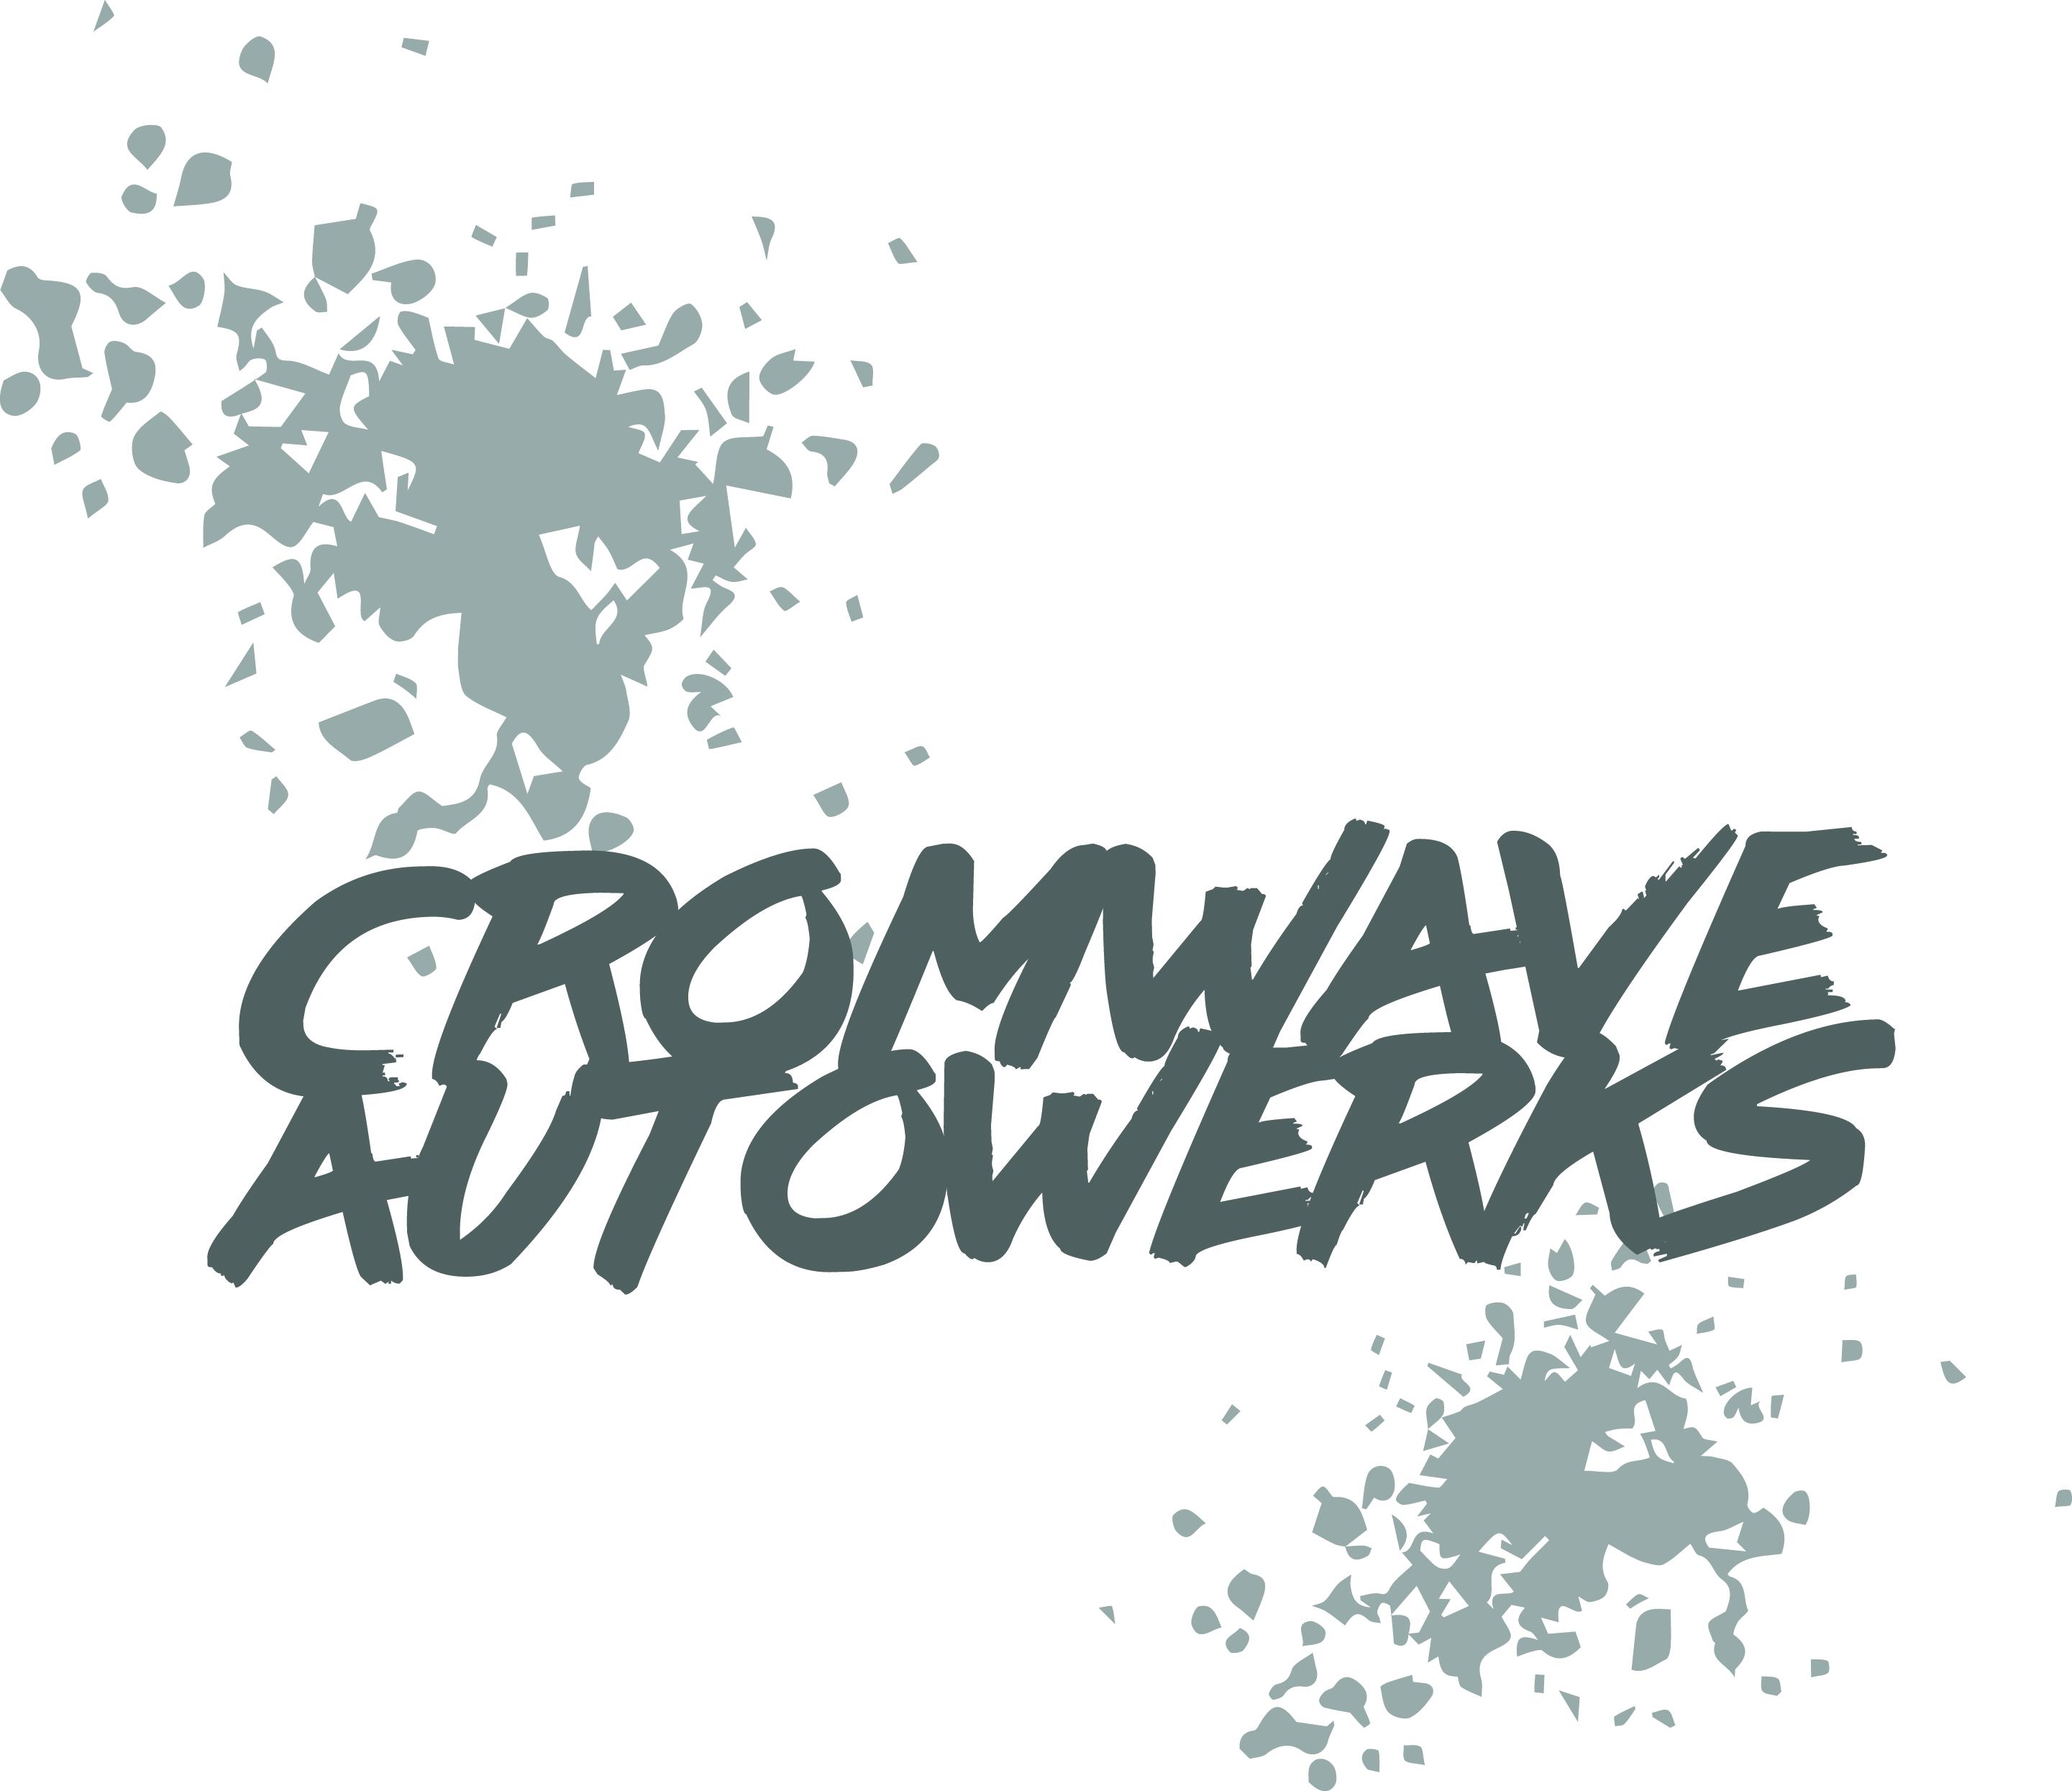 Cromwave Autowerks Logo